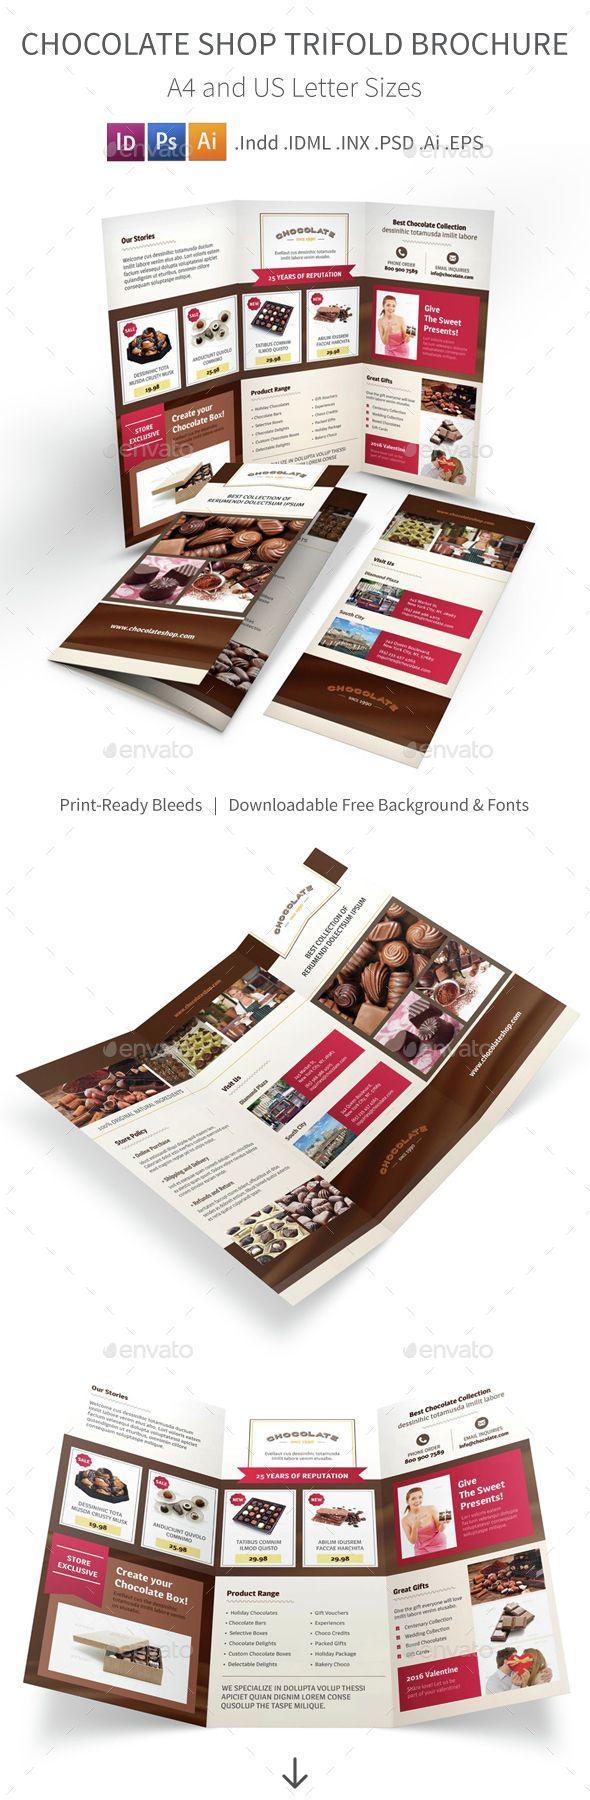 Chocolate Shop Trifold Brochure 2